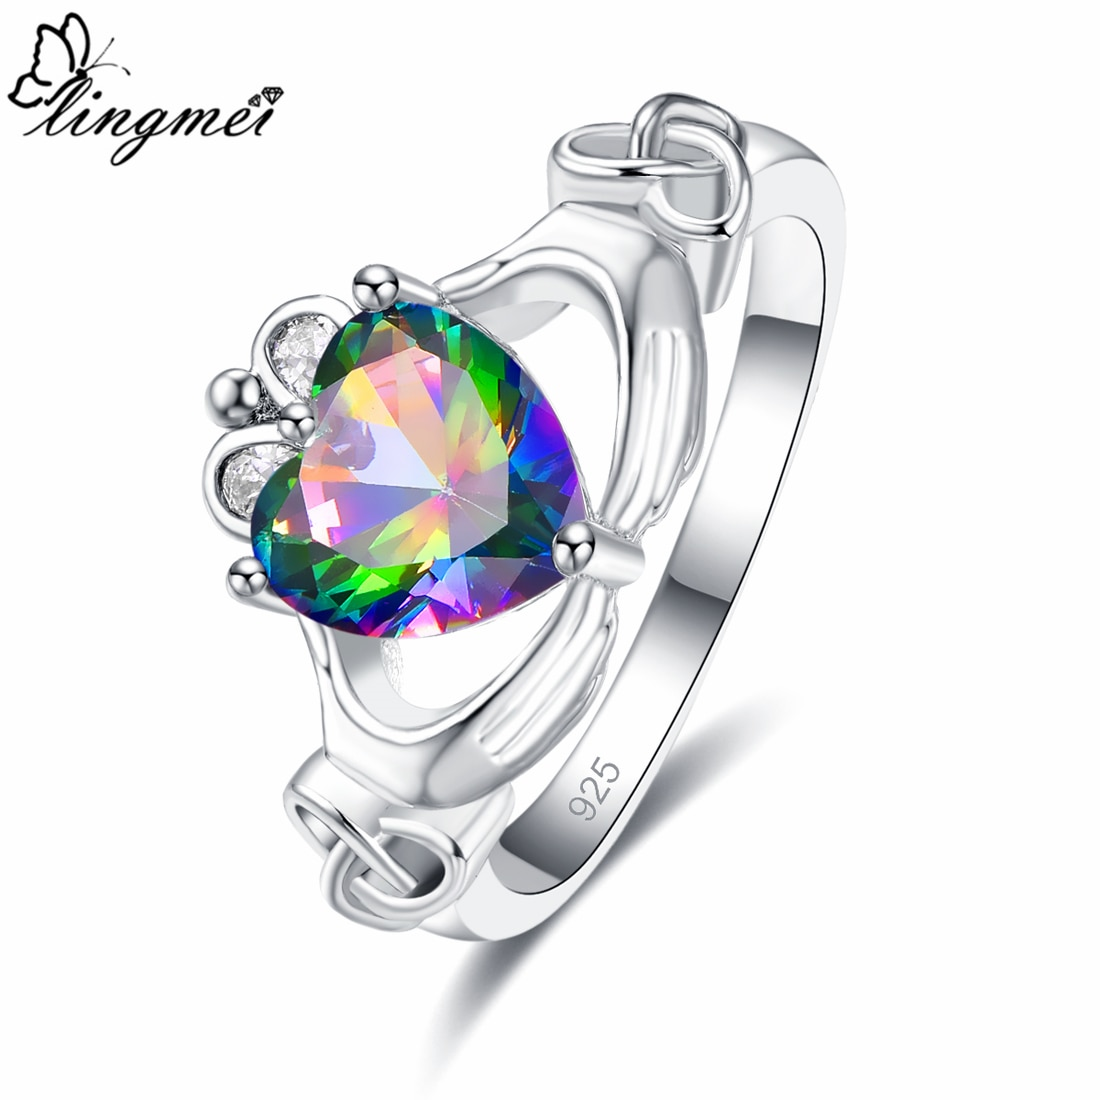 Lingmei Claddagh anillo de compromiso de corazón de novia de estilo de boda para mujeres circonita multicolor Color plata anillo de moda joyería tamaño 6-9